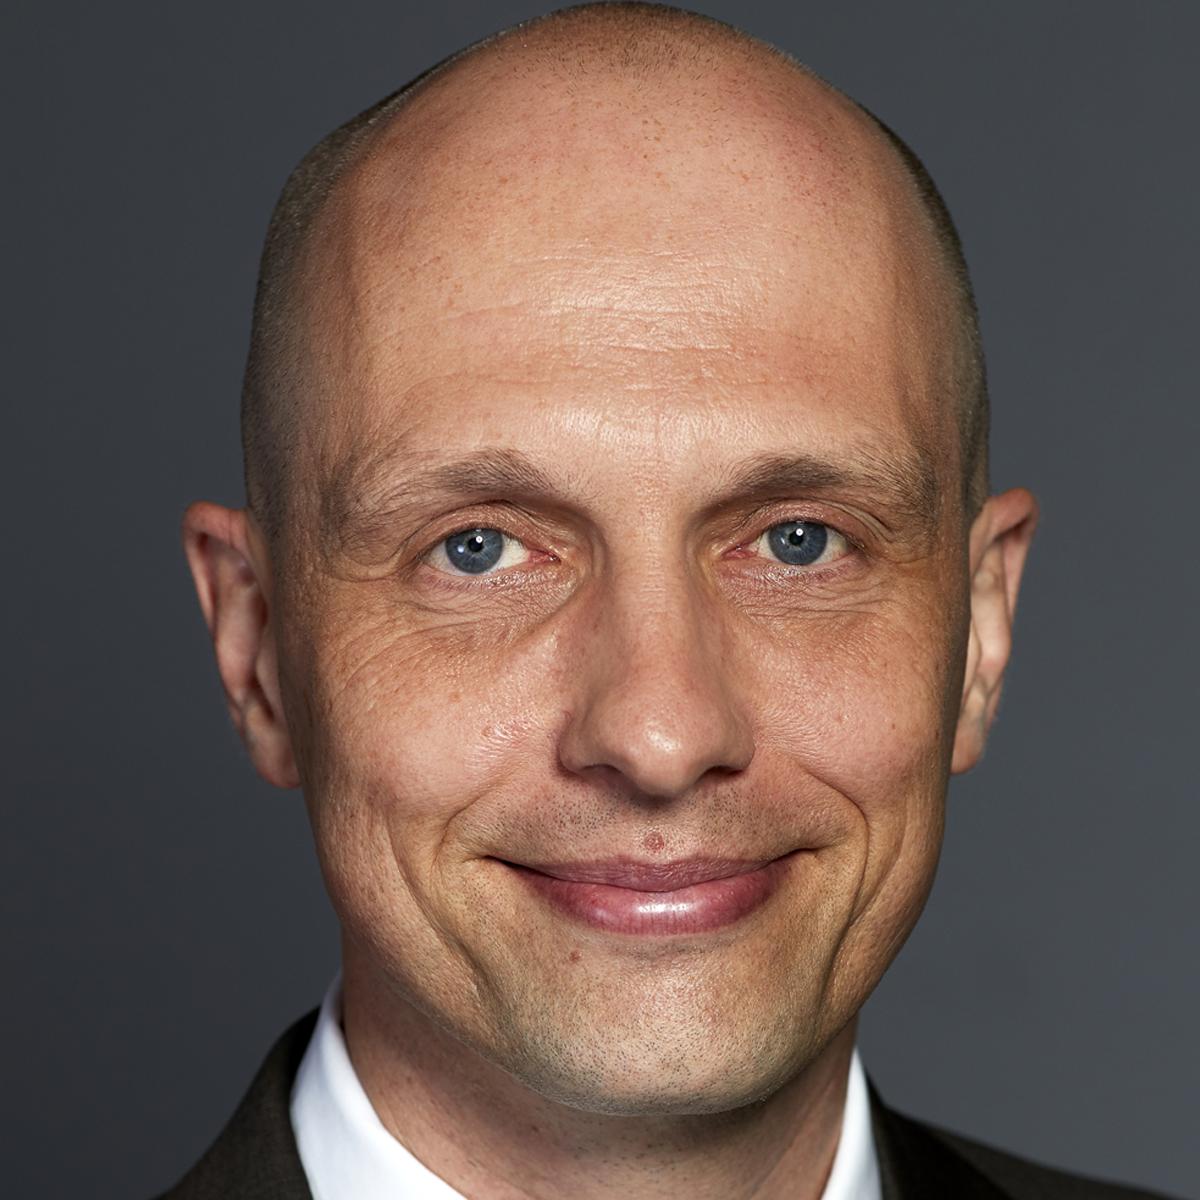 Prof. Dr. Dietmar Grichnik